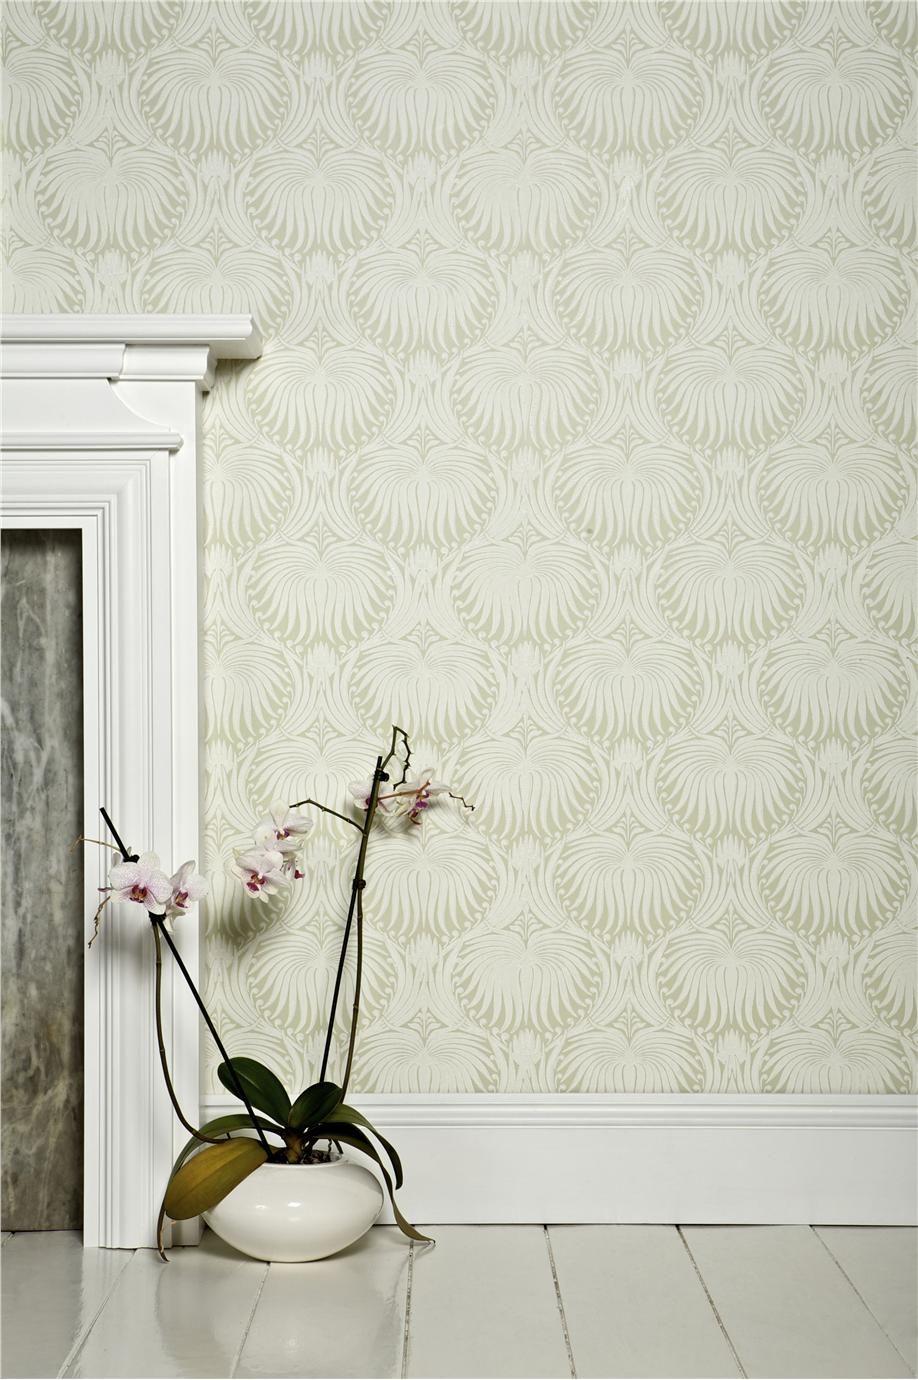 Farrow and ball lotus Lotus wallpaper, Green wallpaper